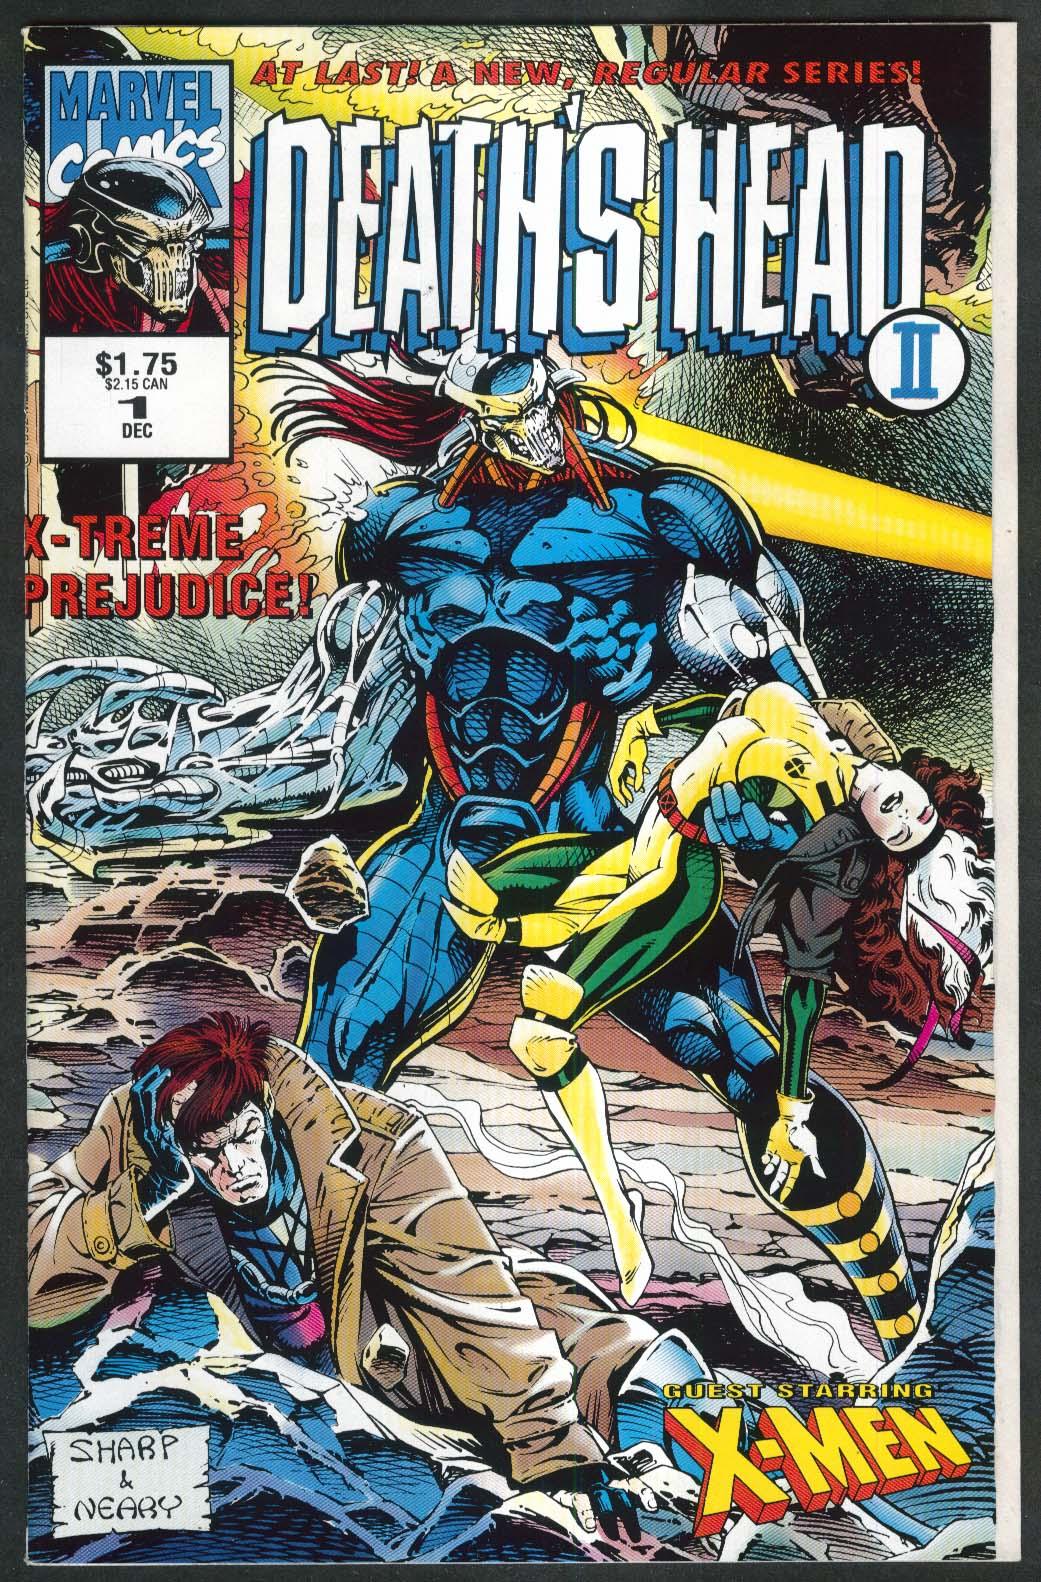 BATTLESTAR GALACTICA #10 Marvel comic book 12 1979